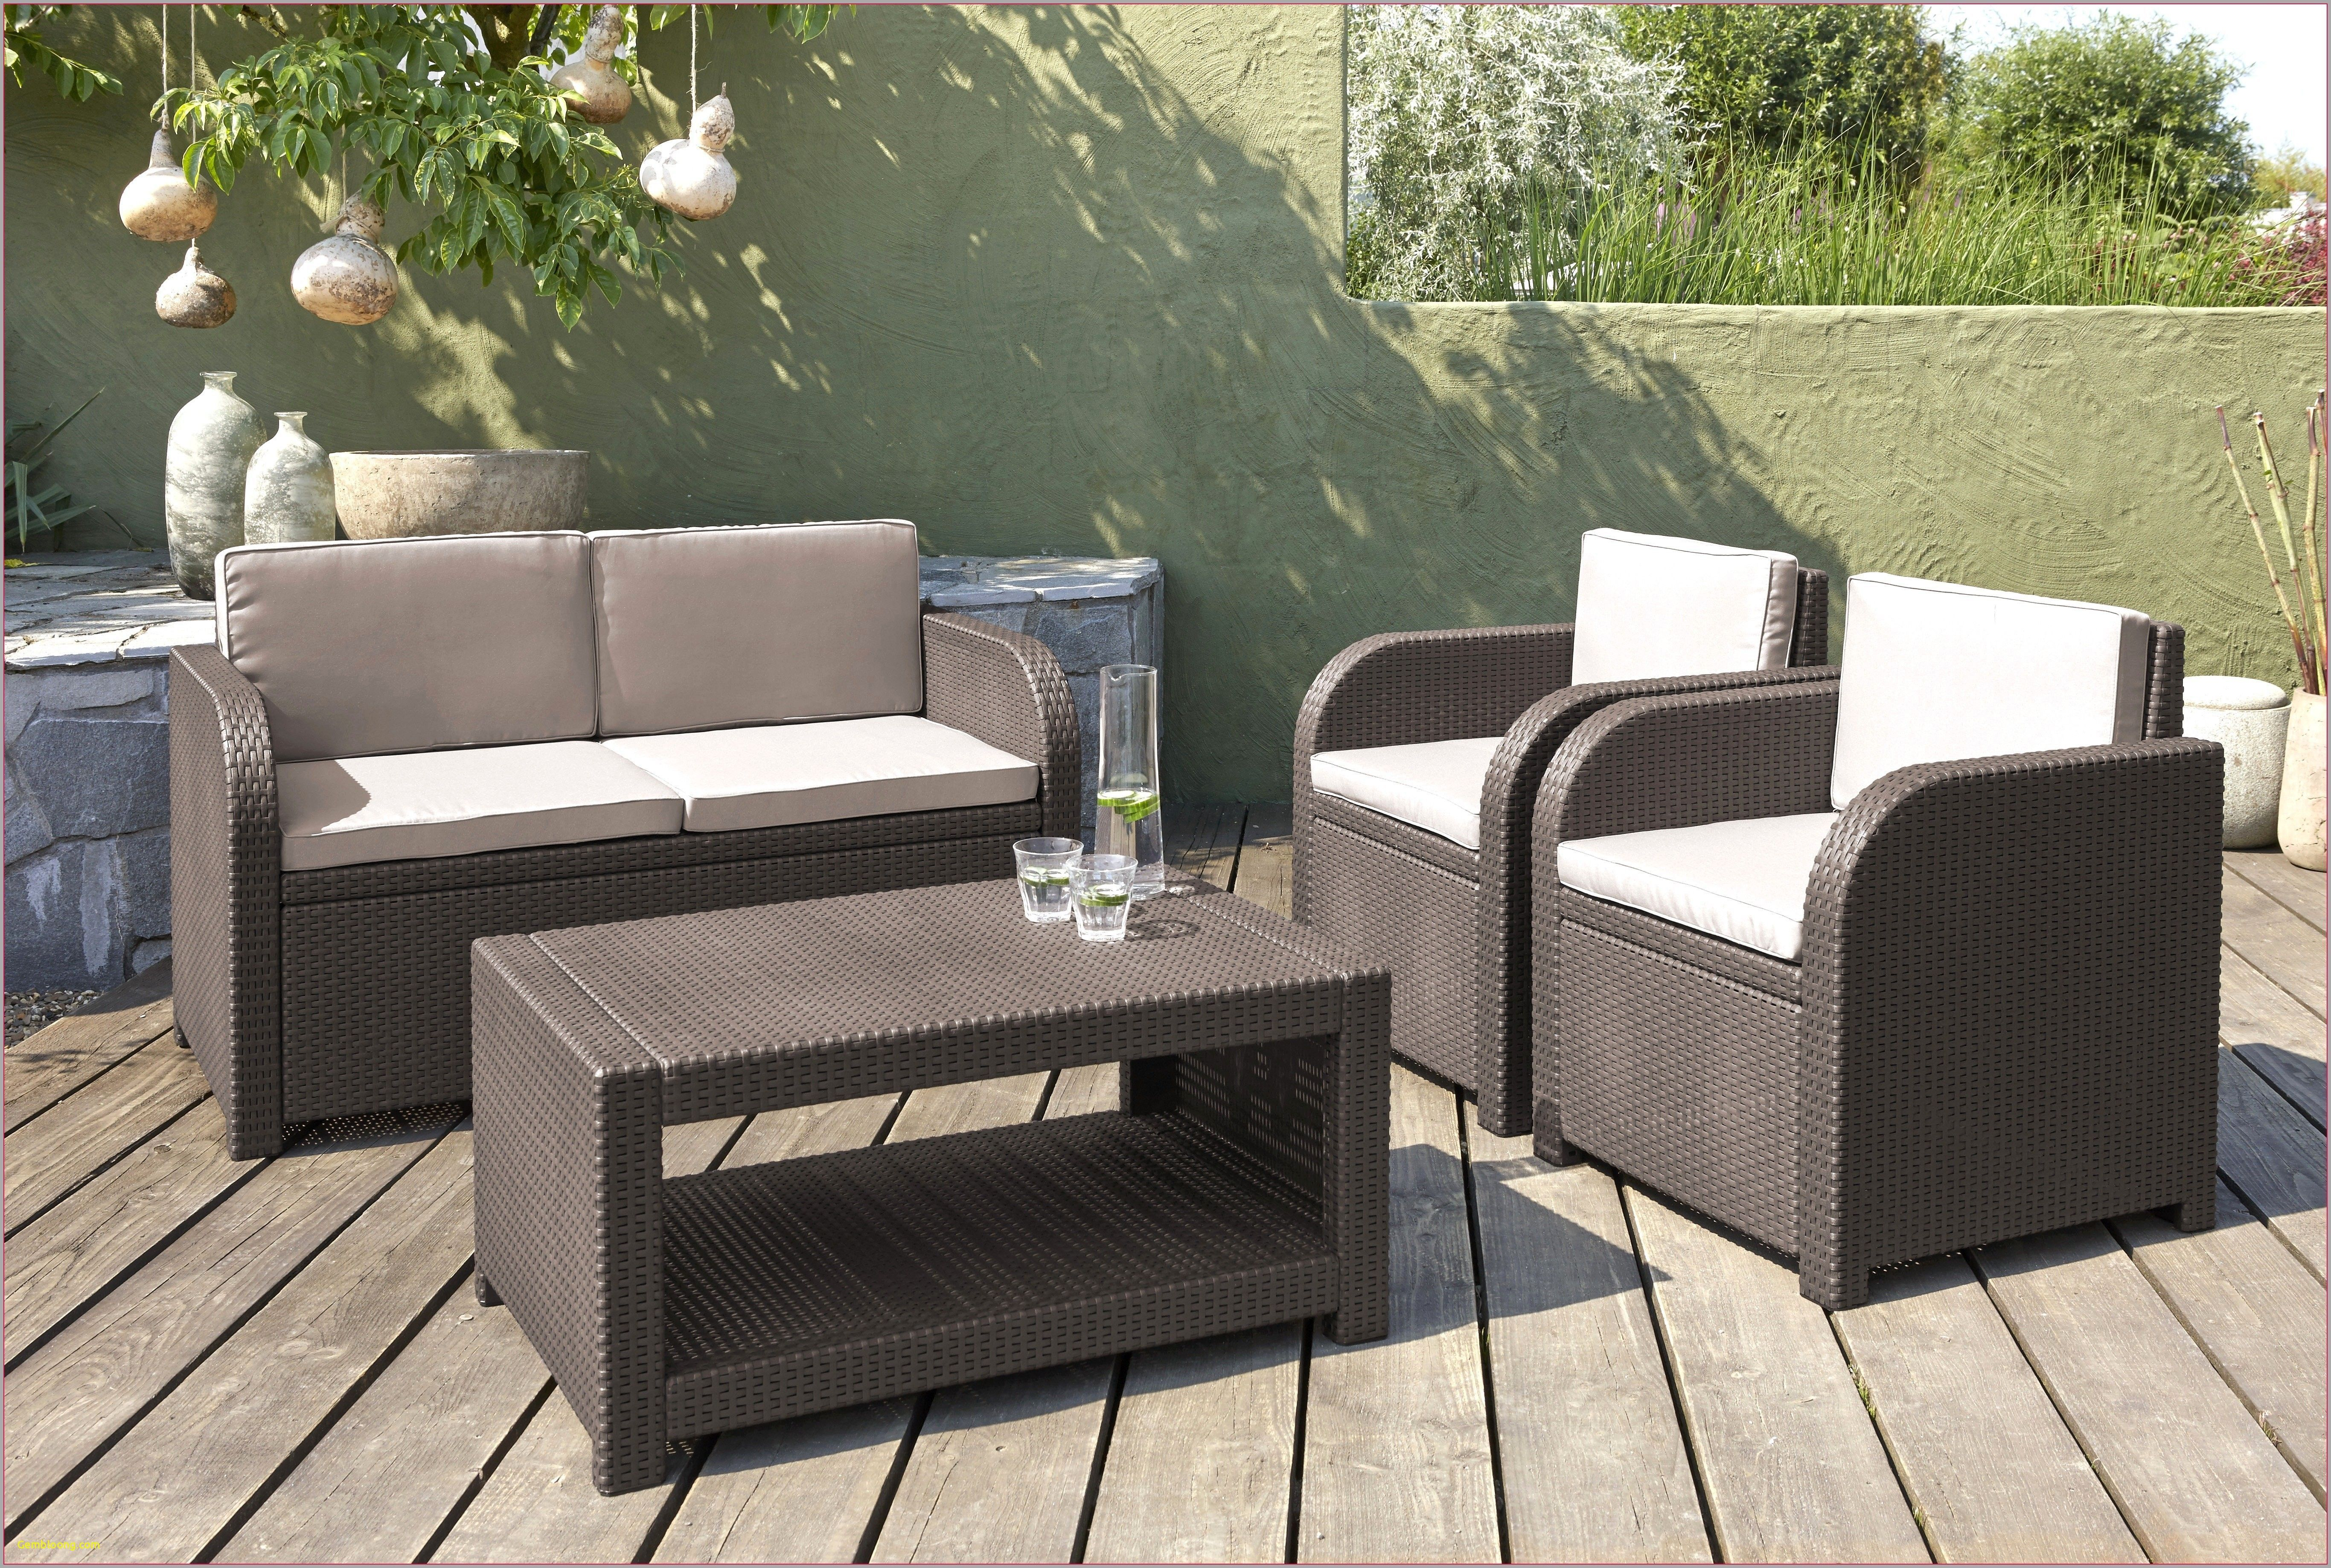 castorama chaise inspirant resine tressee 12 inspirant chaise resine tressee castorama check more at meubleparis club